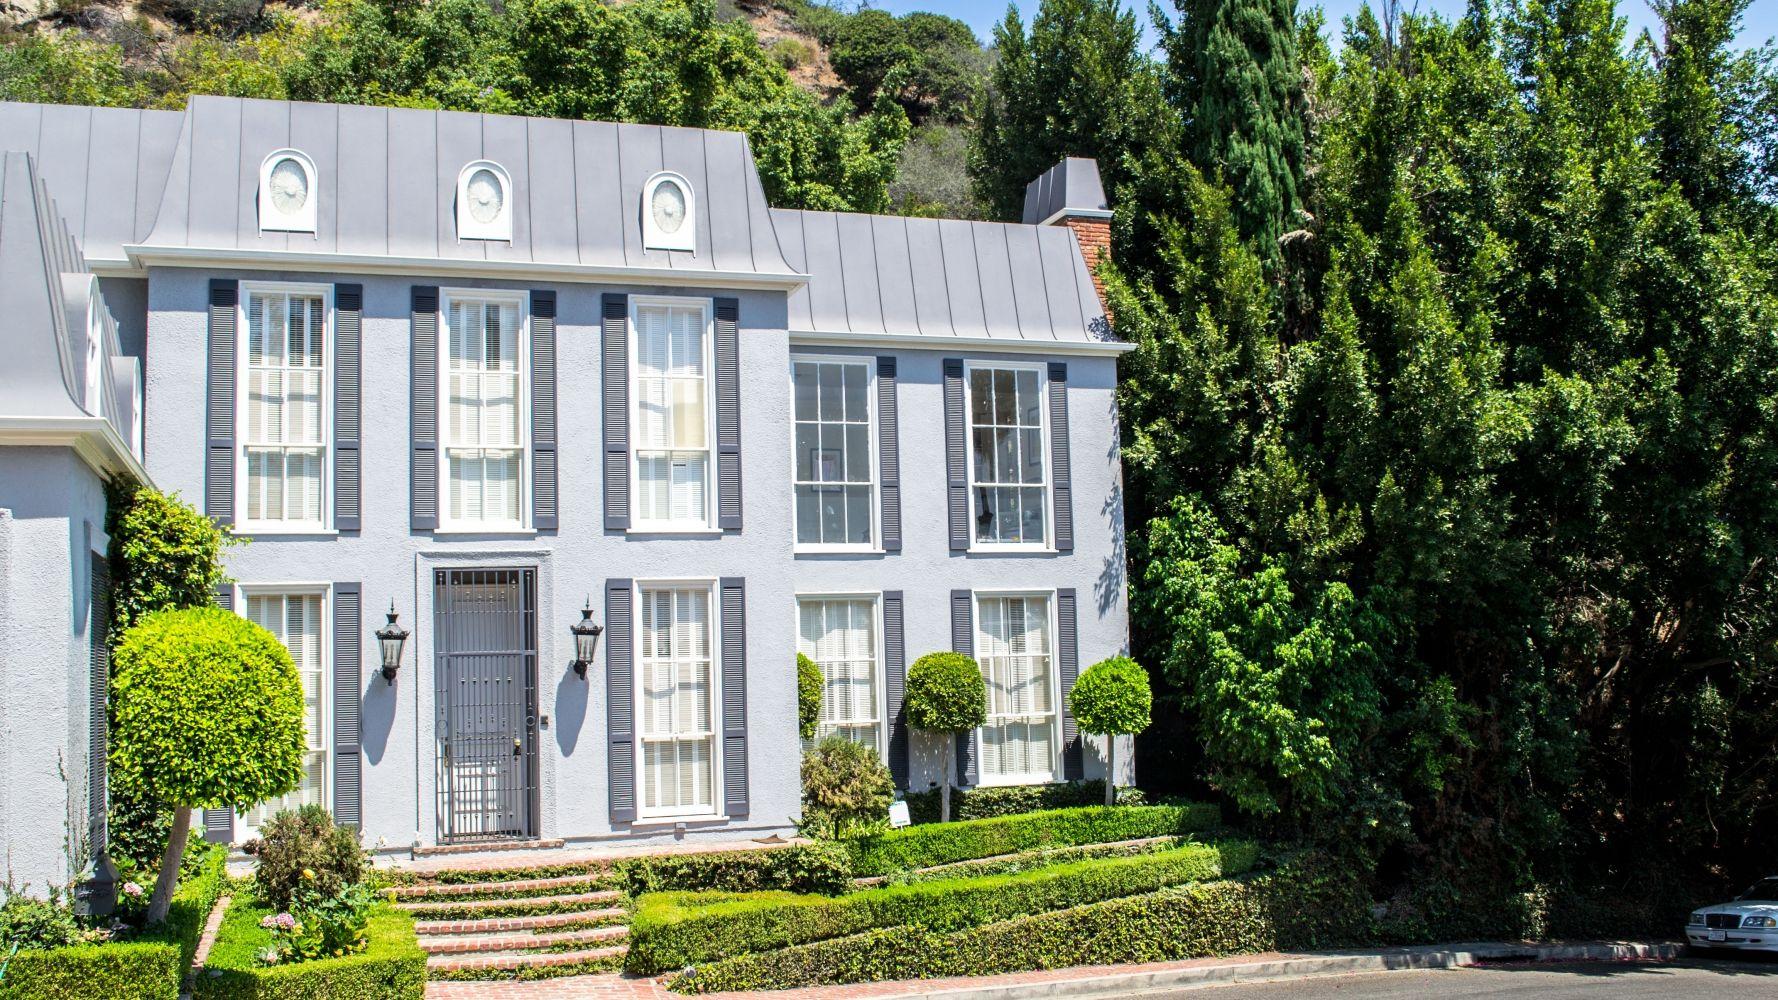 House of Dreams #dreams #green #houses #design #homes #landscape ...